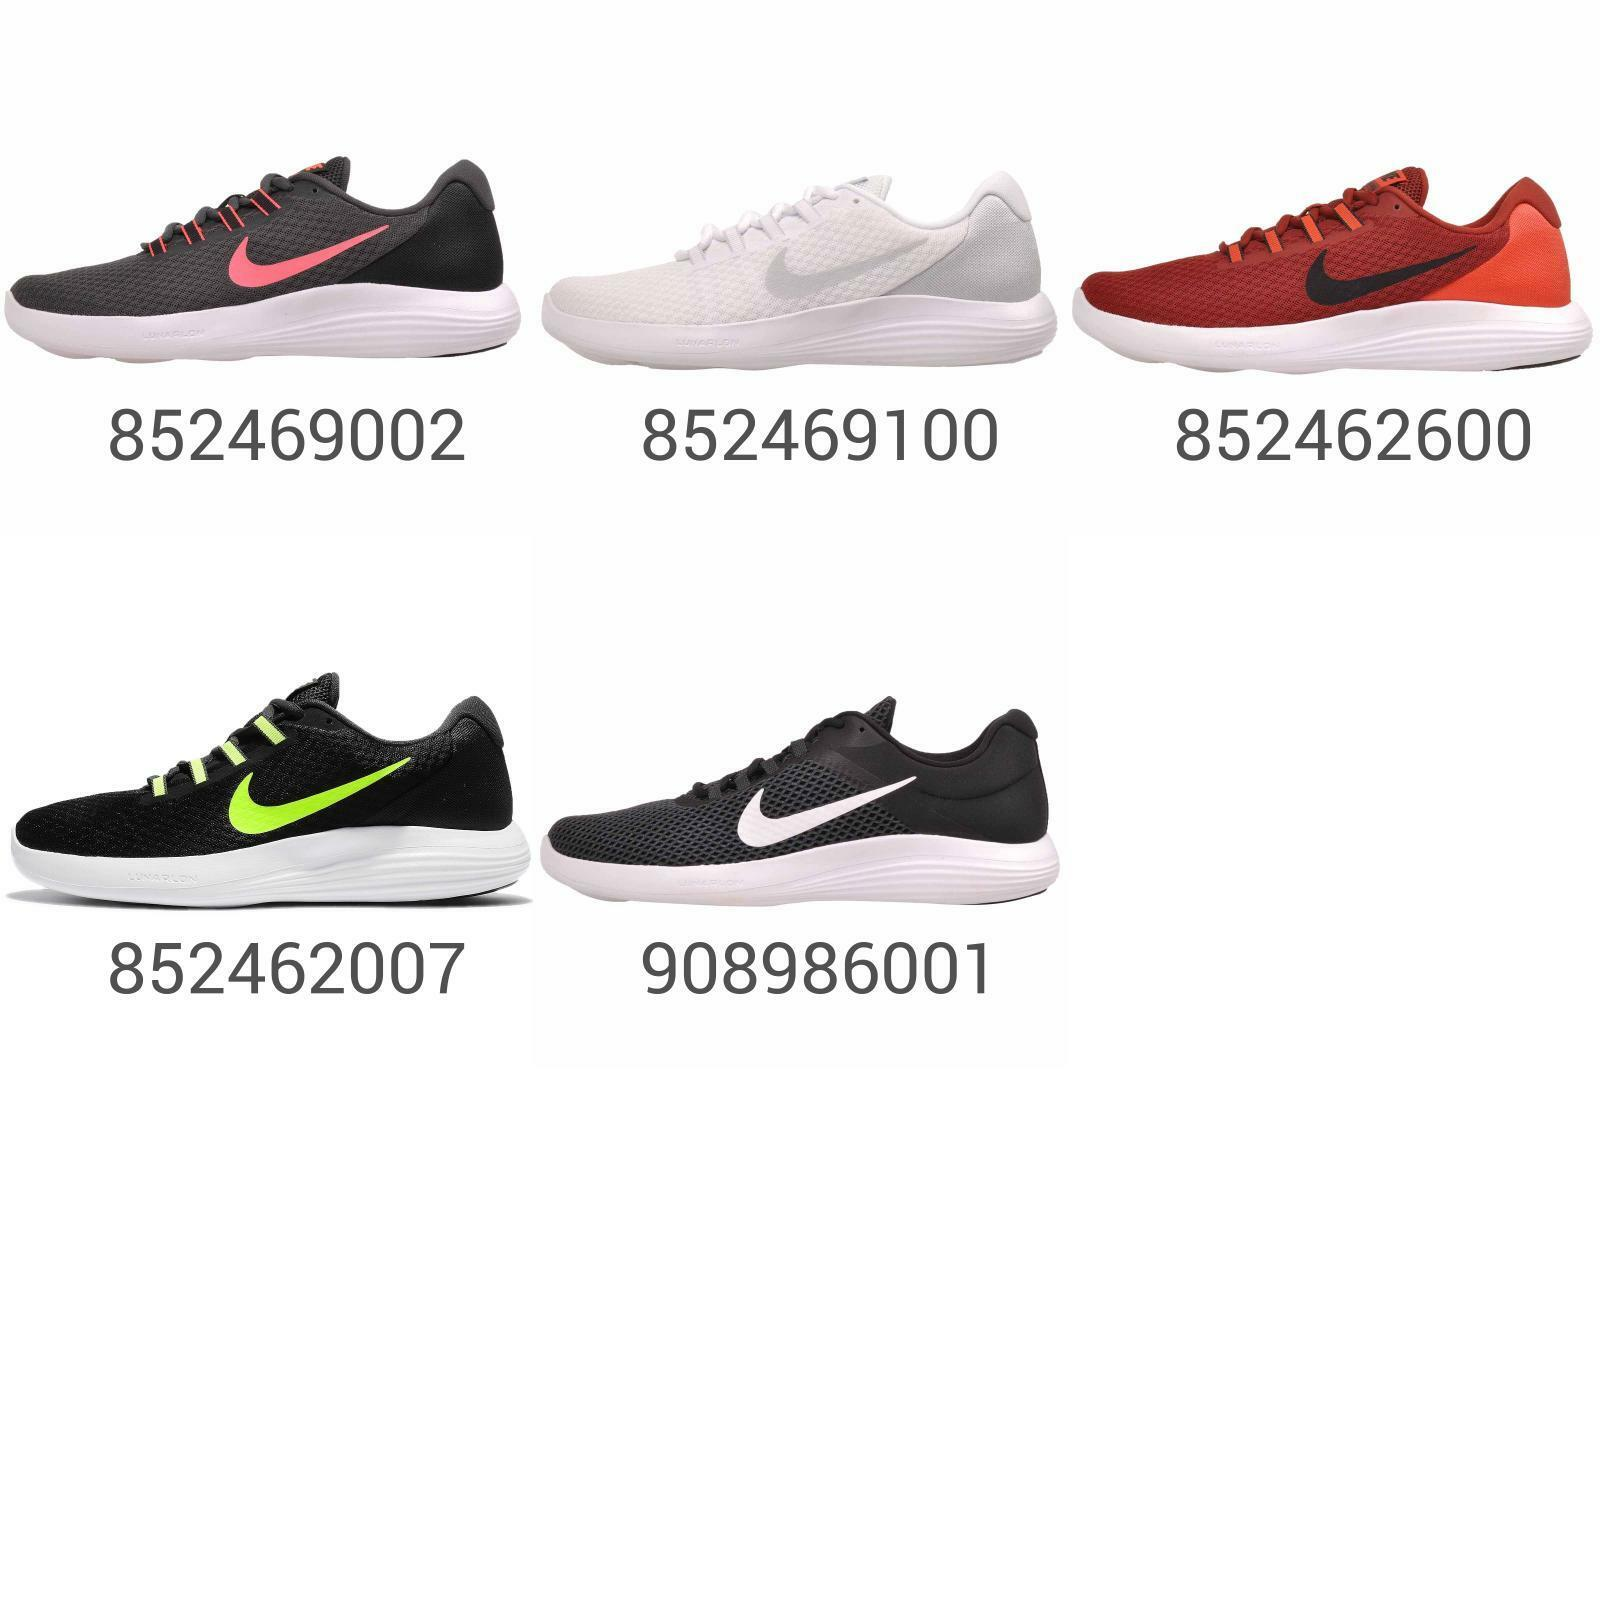 Nike lunarconverge 2 männer ab frauen schuhe turnschuhe ab männer 1. 7d00ff